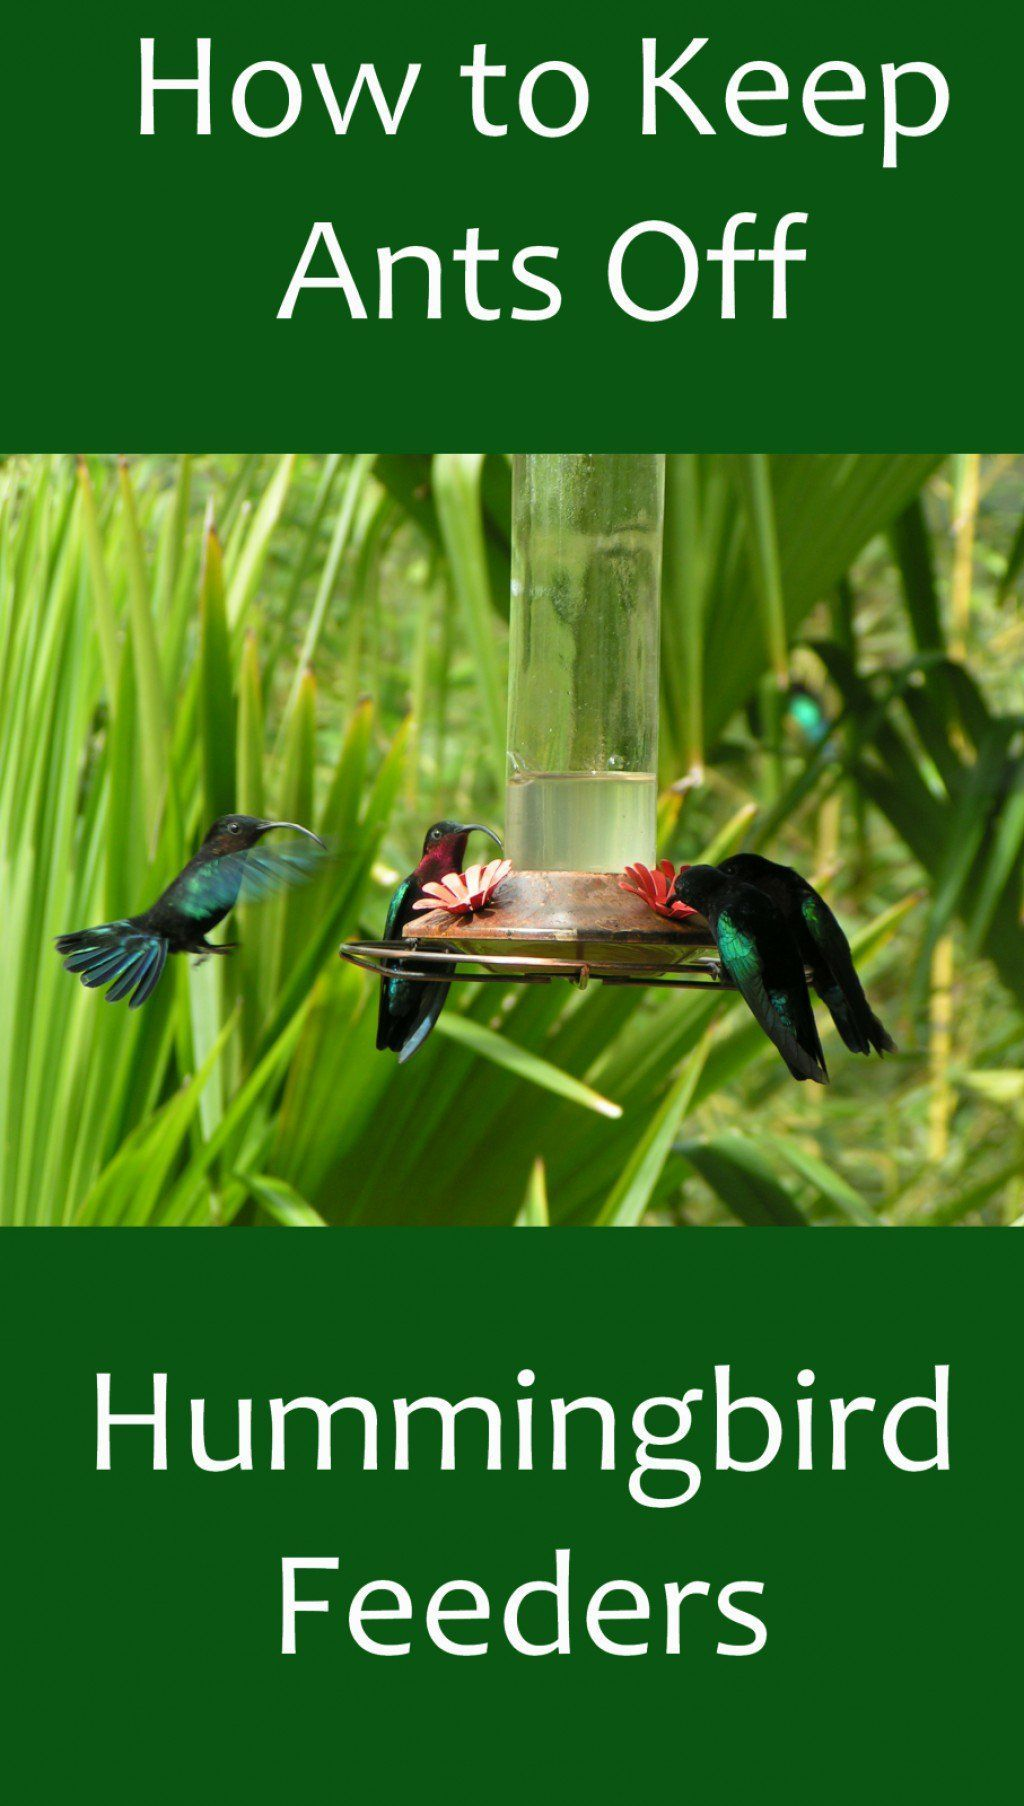 How to keep ants away from hummingbird feeders humming